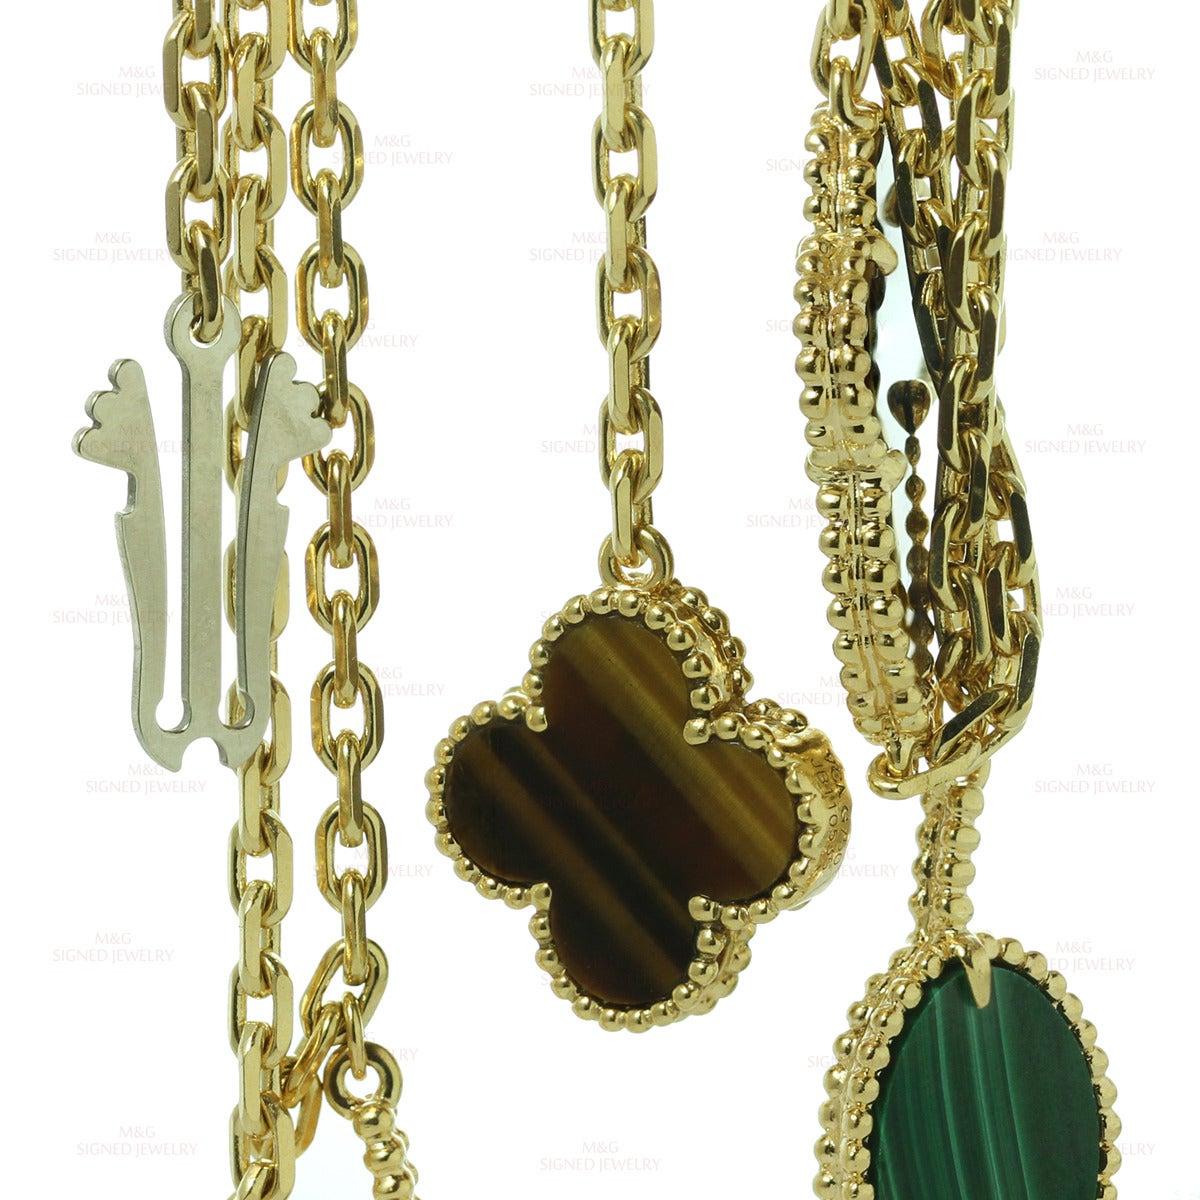 Van Cleef Lucky Alhambra Necklace: Van Cleef And Arpels Lucky Alhambra 12 Motif Gemstone Gold